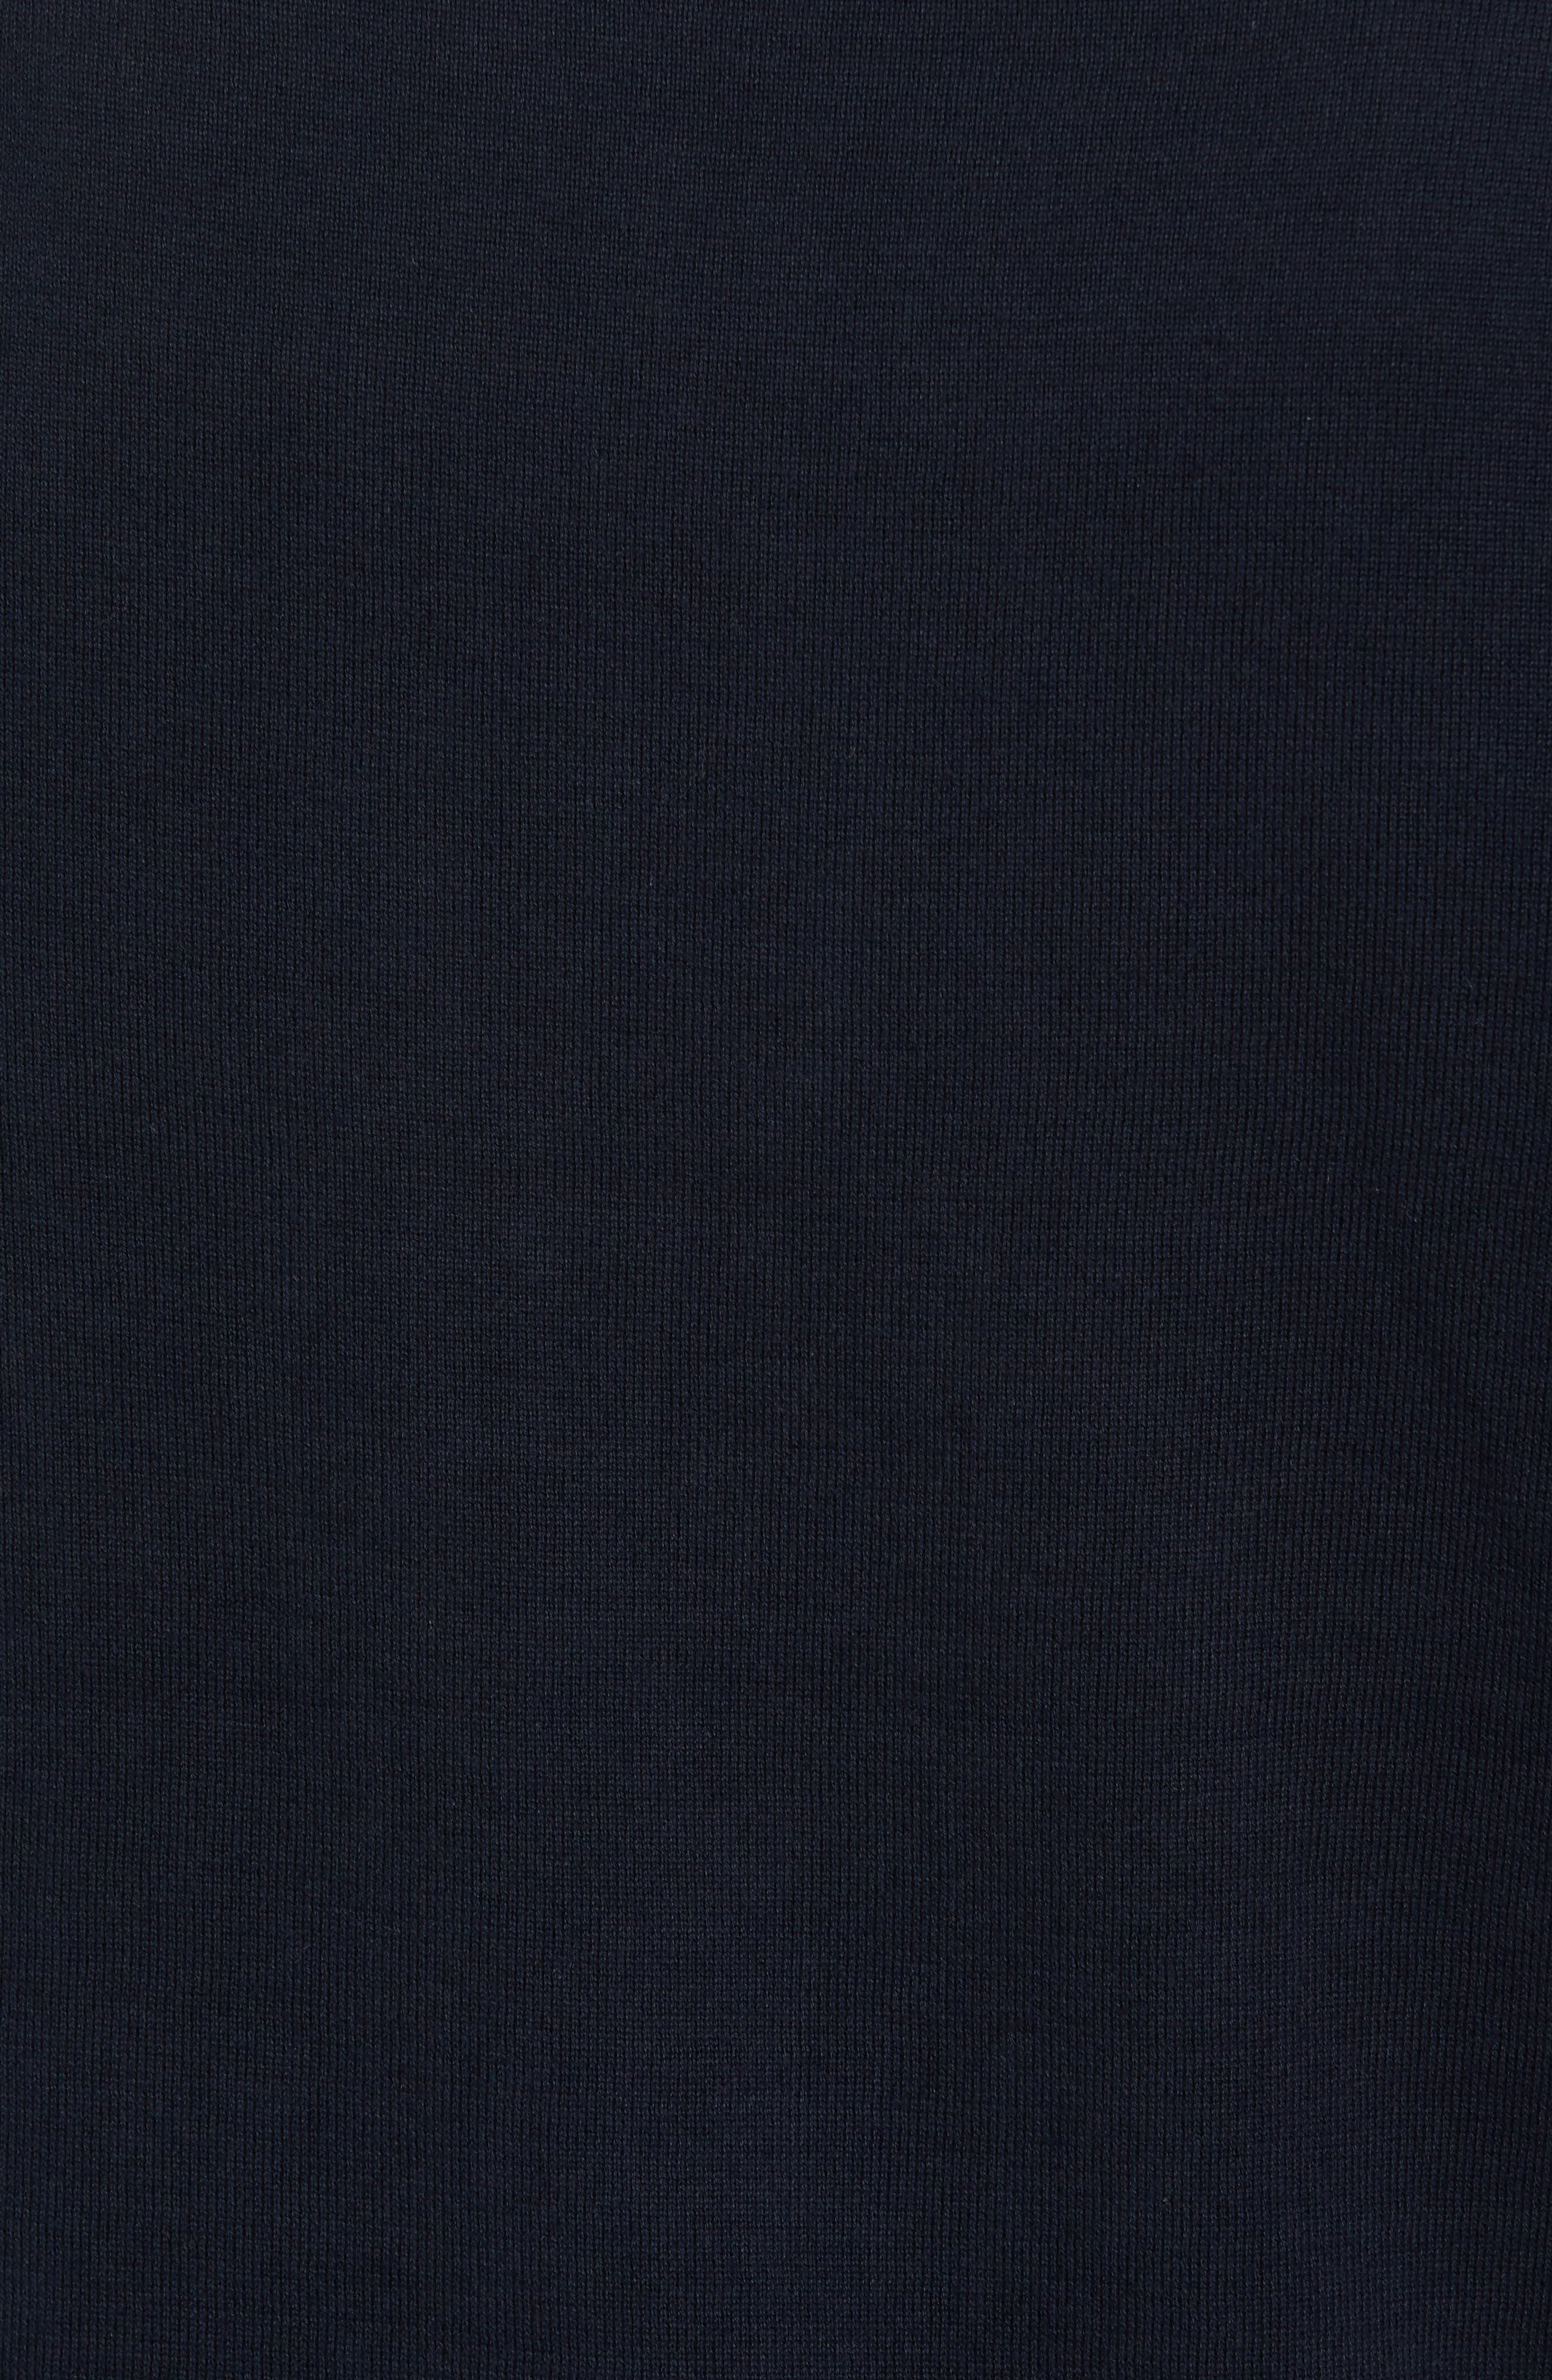 Fine Gauge Turtleneck,                             Alternate thumbnail 5, color,                             410